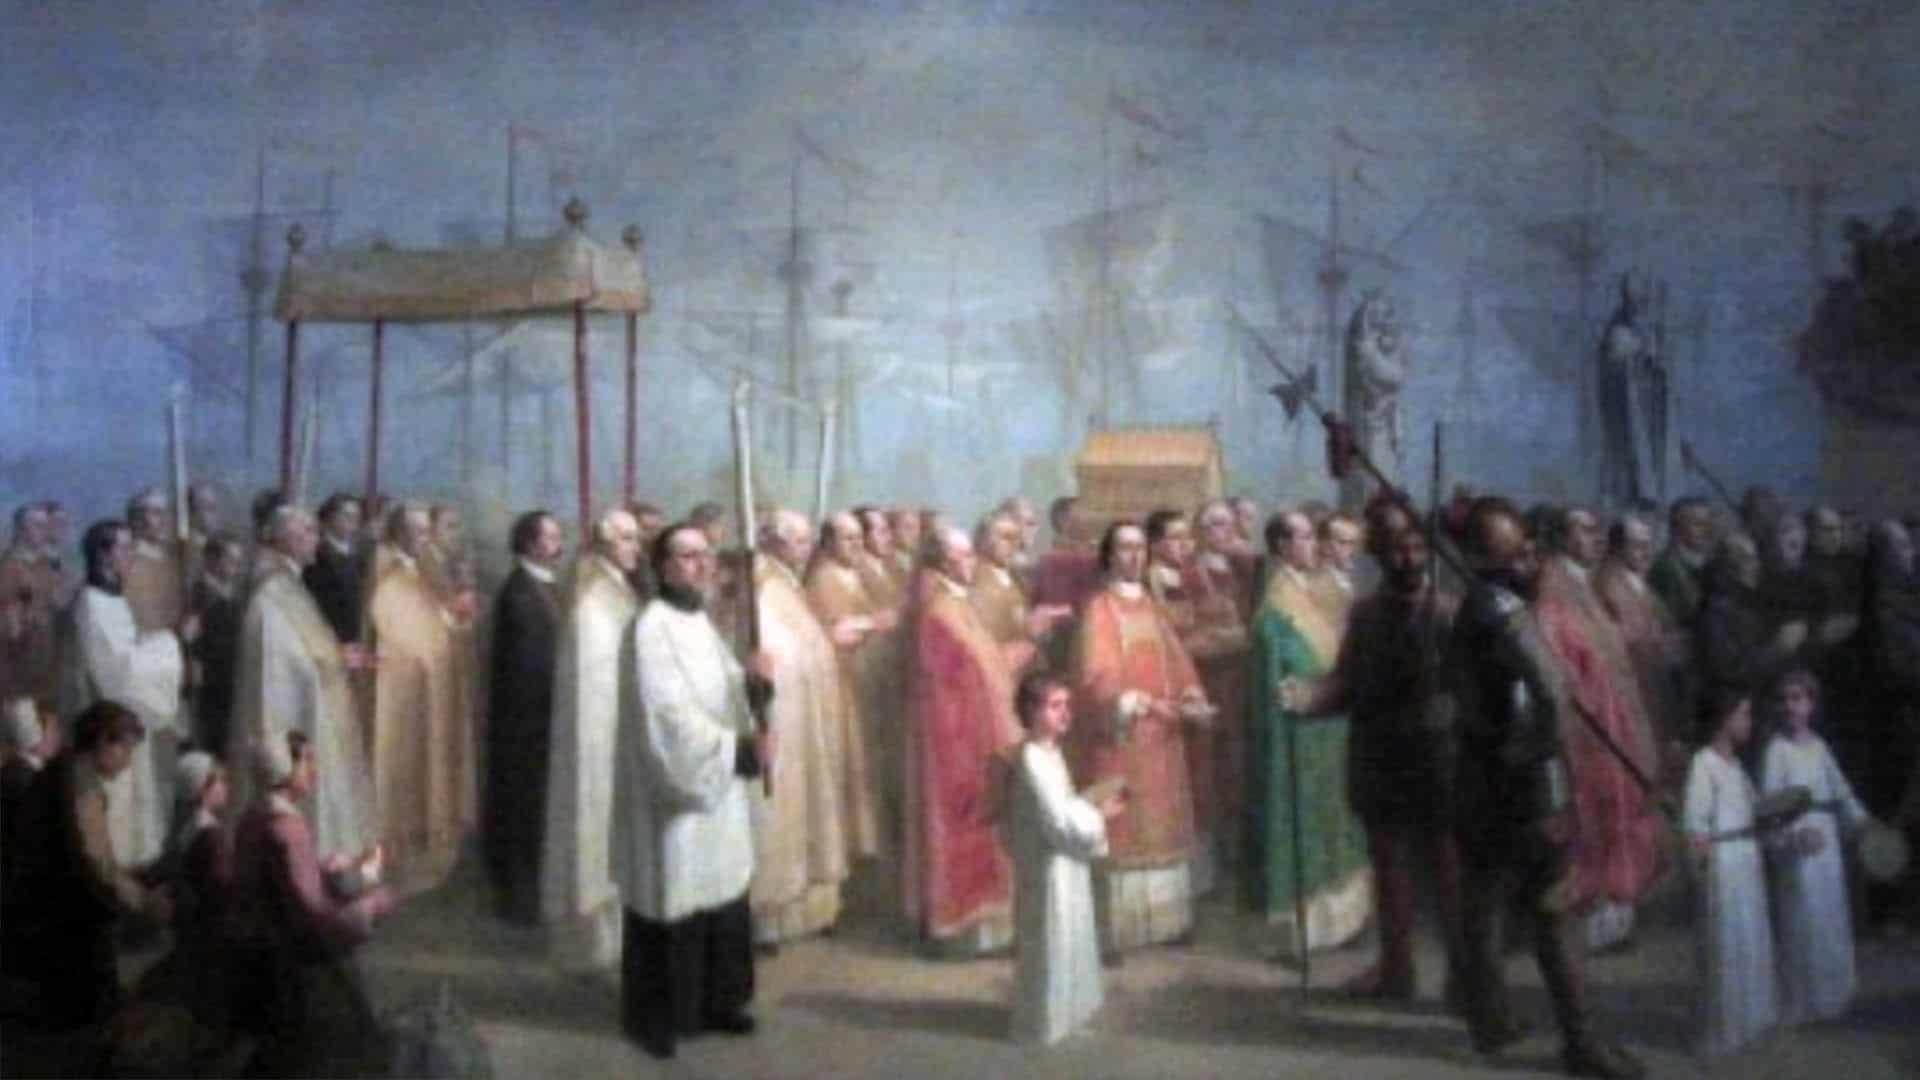 olv-ter-nood-heiloo-mirakel-van-amsterdam-processie-sacramentsdag-heilig-sacrament